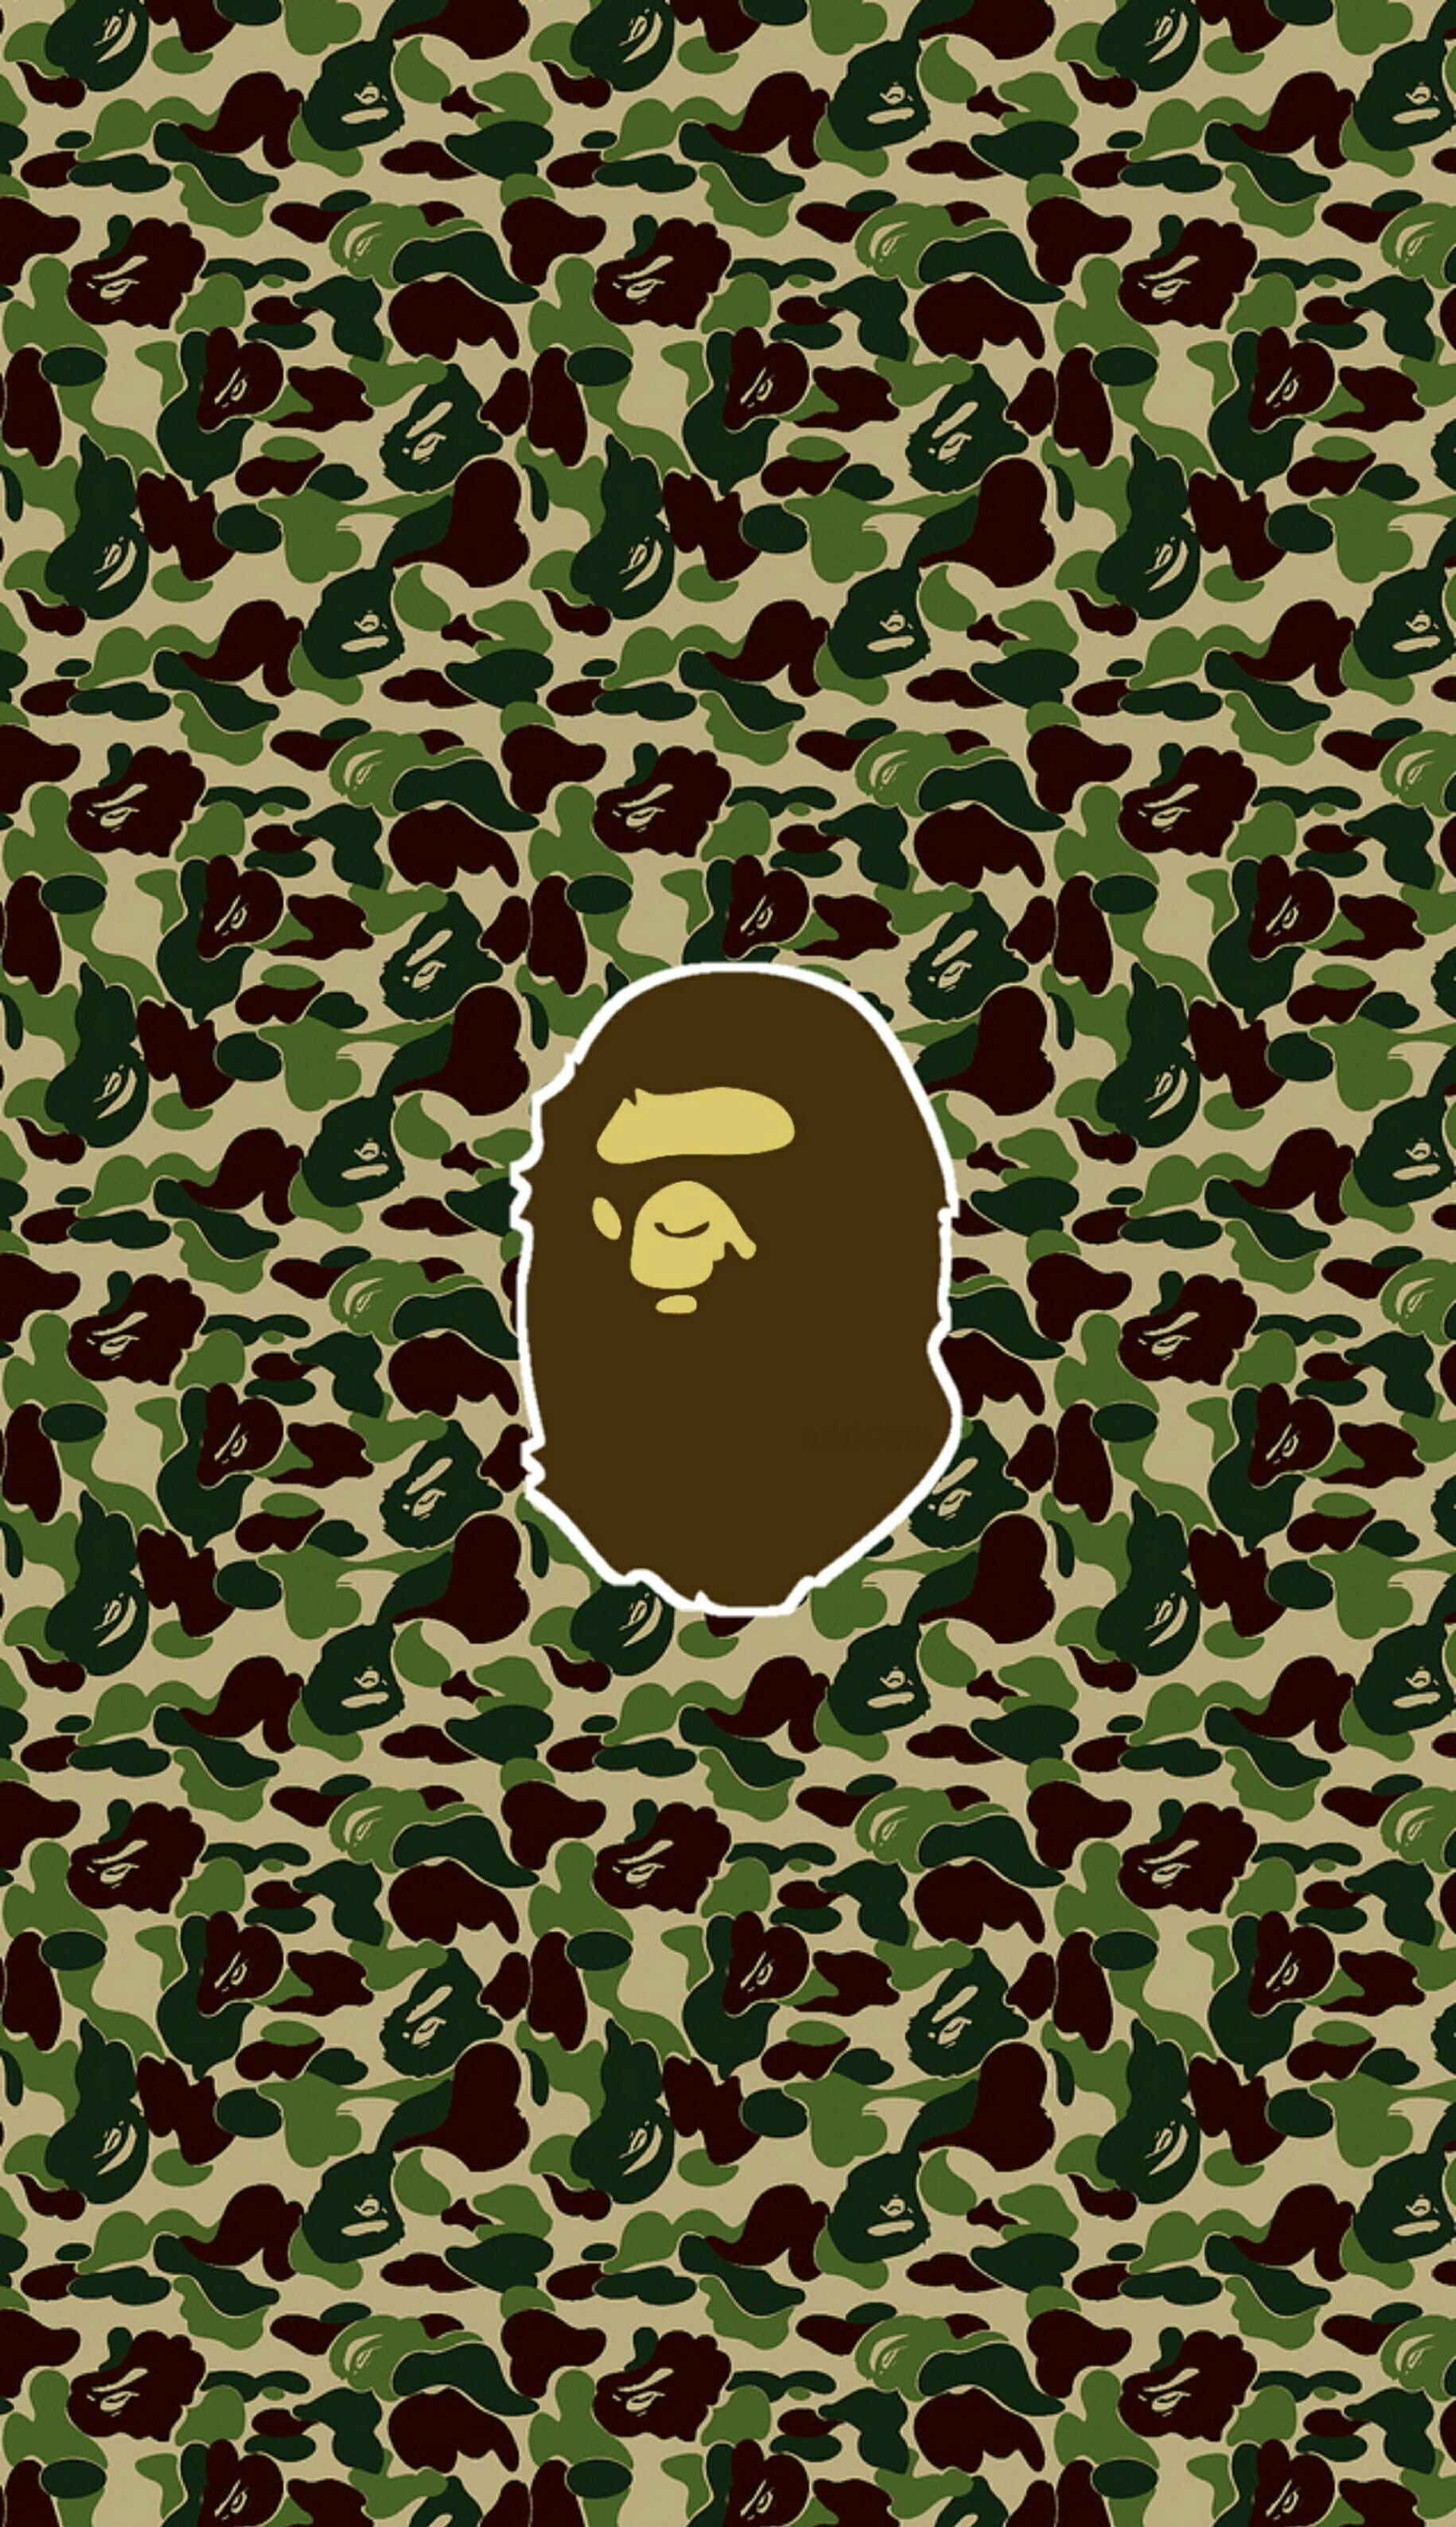 Bape Ape Abc Camo Logo Wallpaper Bape Wallpaper Iphone Bape Wallpapers Streetwear Wallpaper